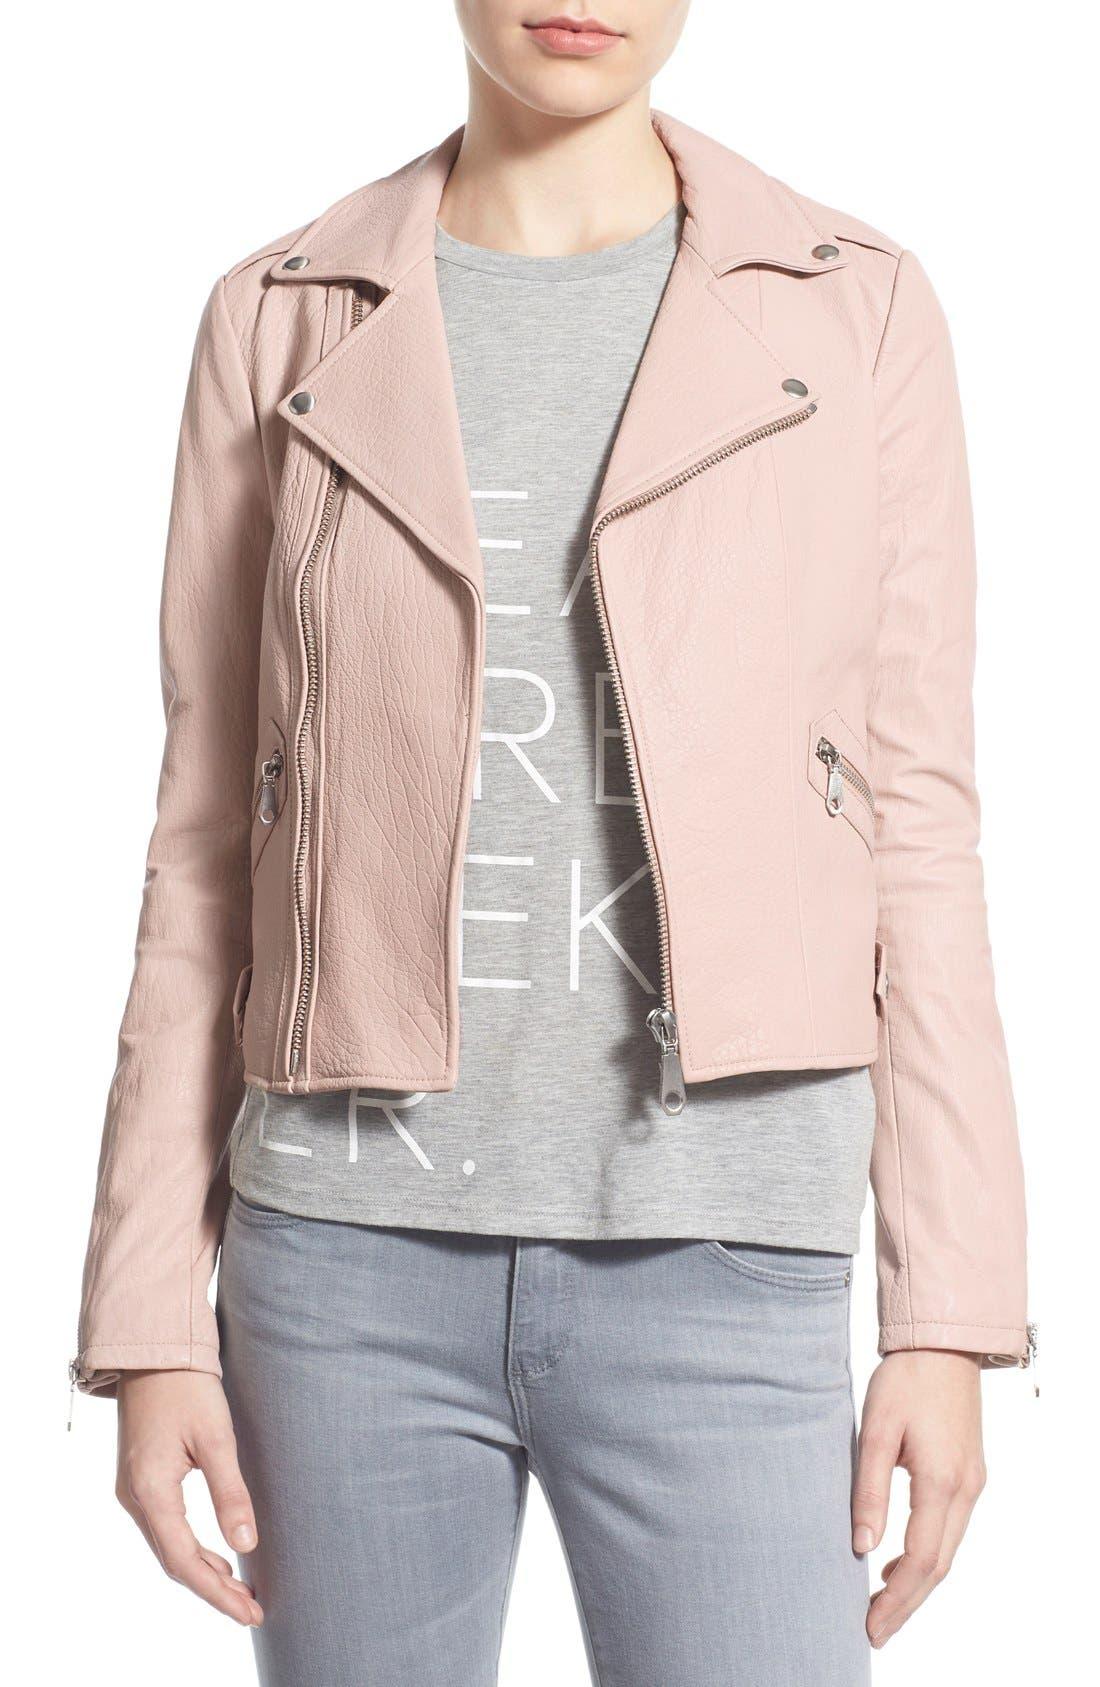 Main Image - Rebecca Minkoff Pebble Leather Jacket